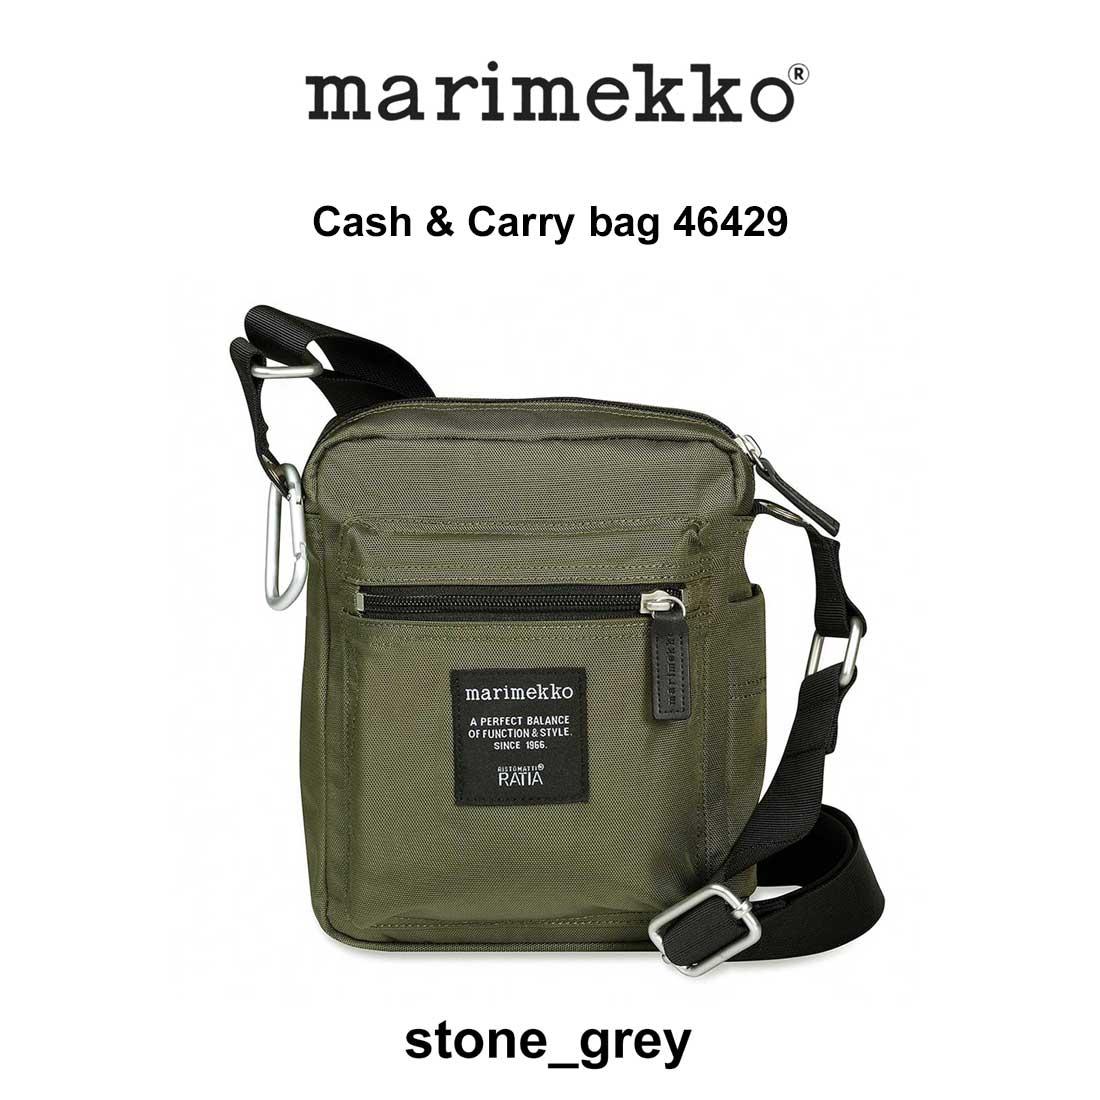 marimekko(マリメッコ)ショルダーバッグ キャッシュ&キャリー Cash & Carry bag 46429